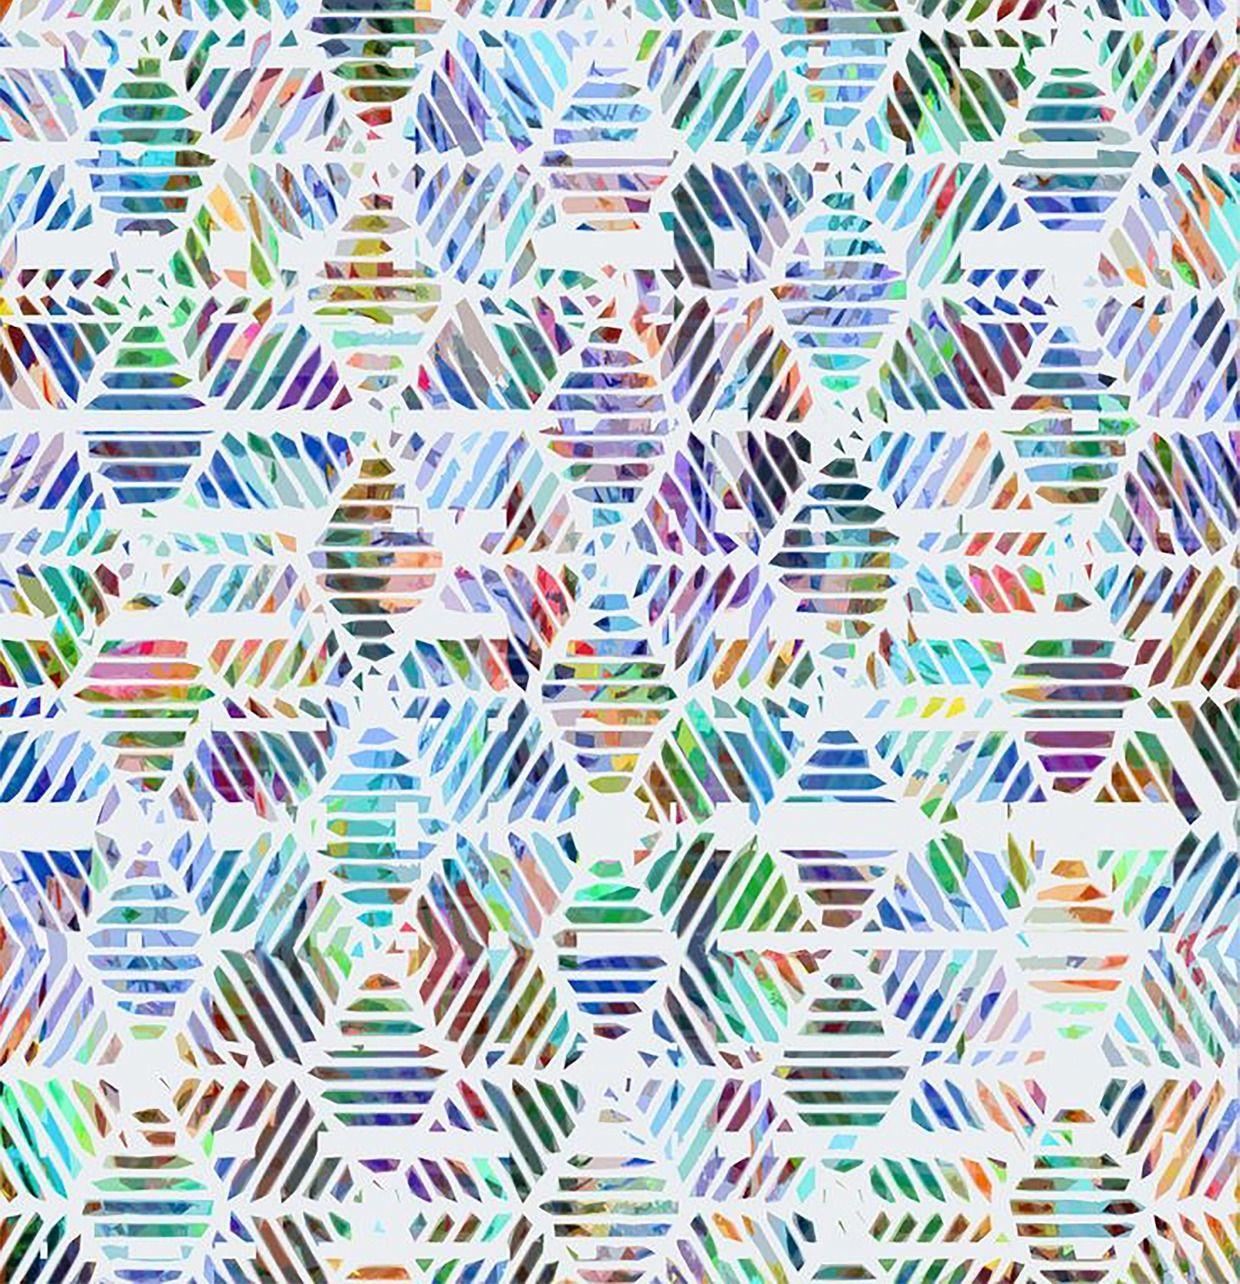 Pin By Jo Lowe On Fabric Pattern In 2019 Surface Pattern Design Print Patterns Pattern Illustration